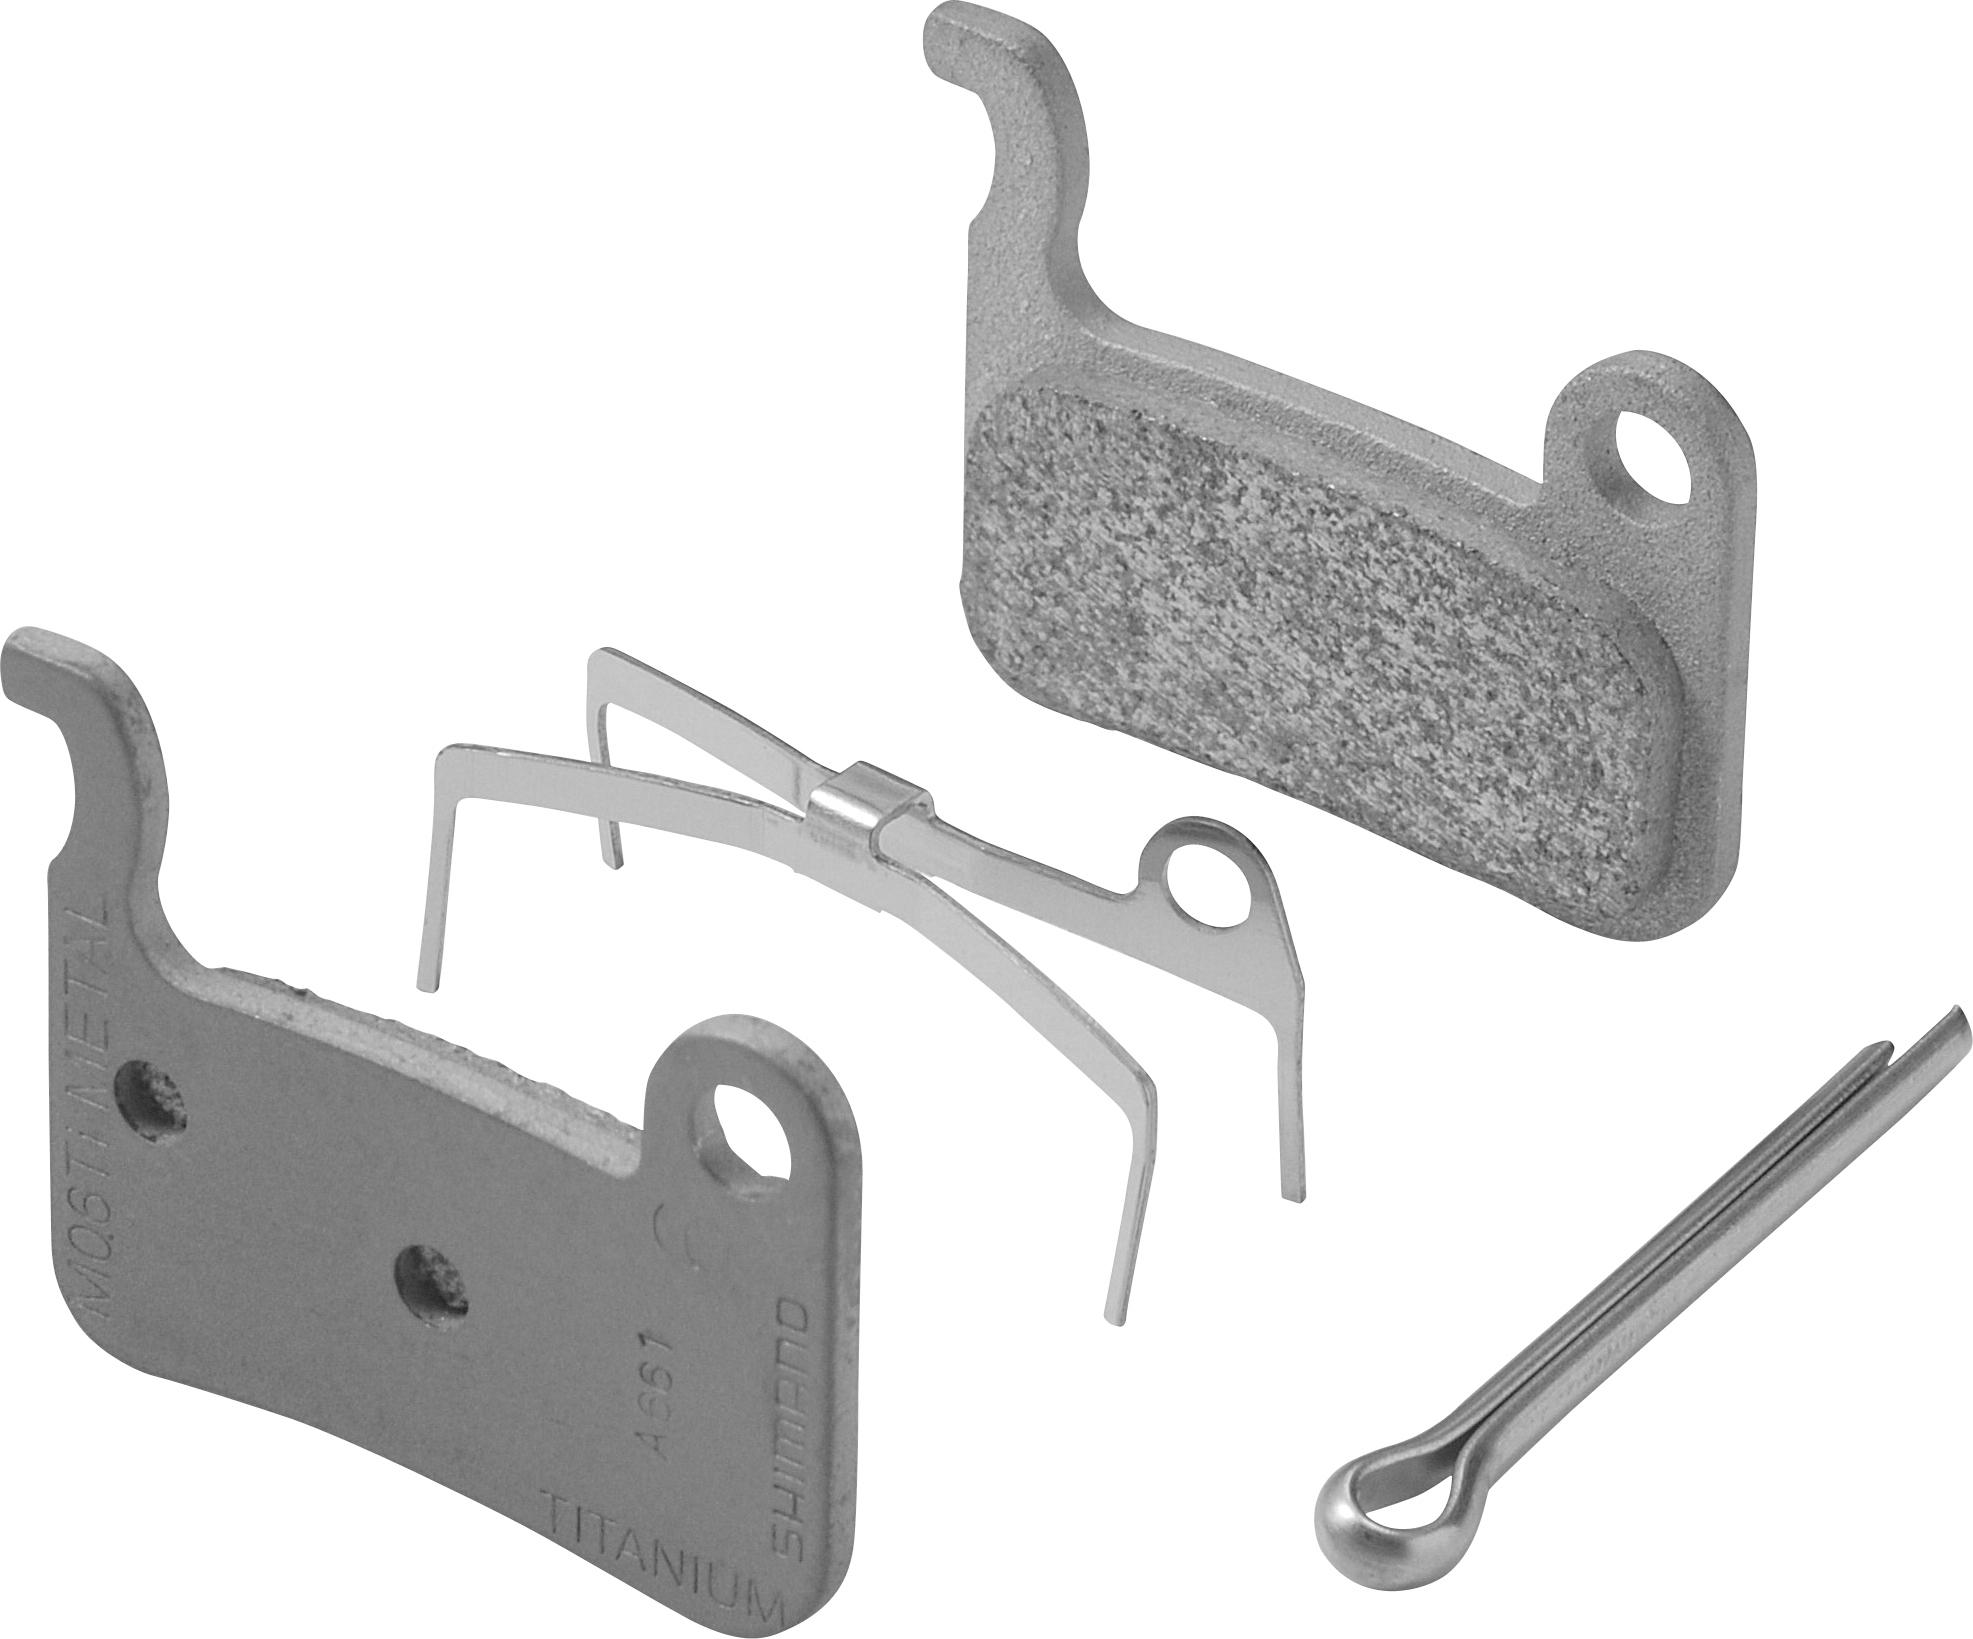 SHIMANO brzdové destičky kovové M06, pár